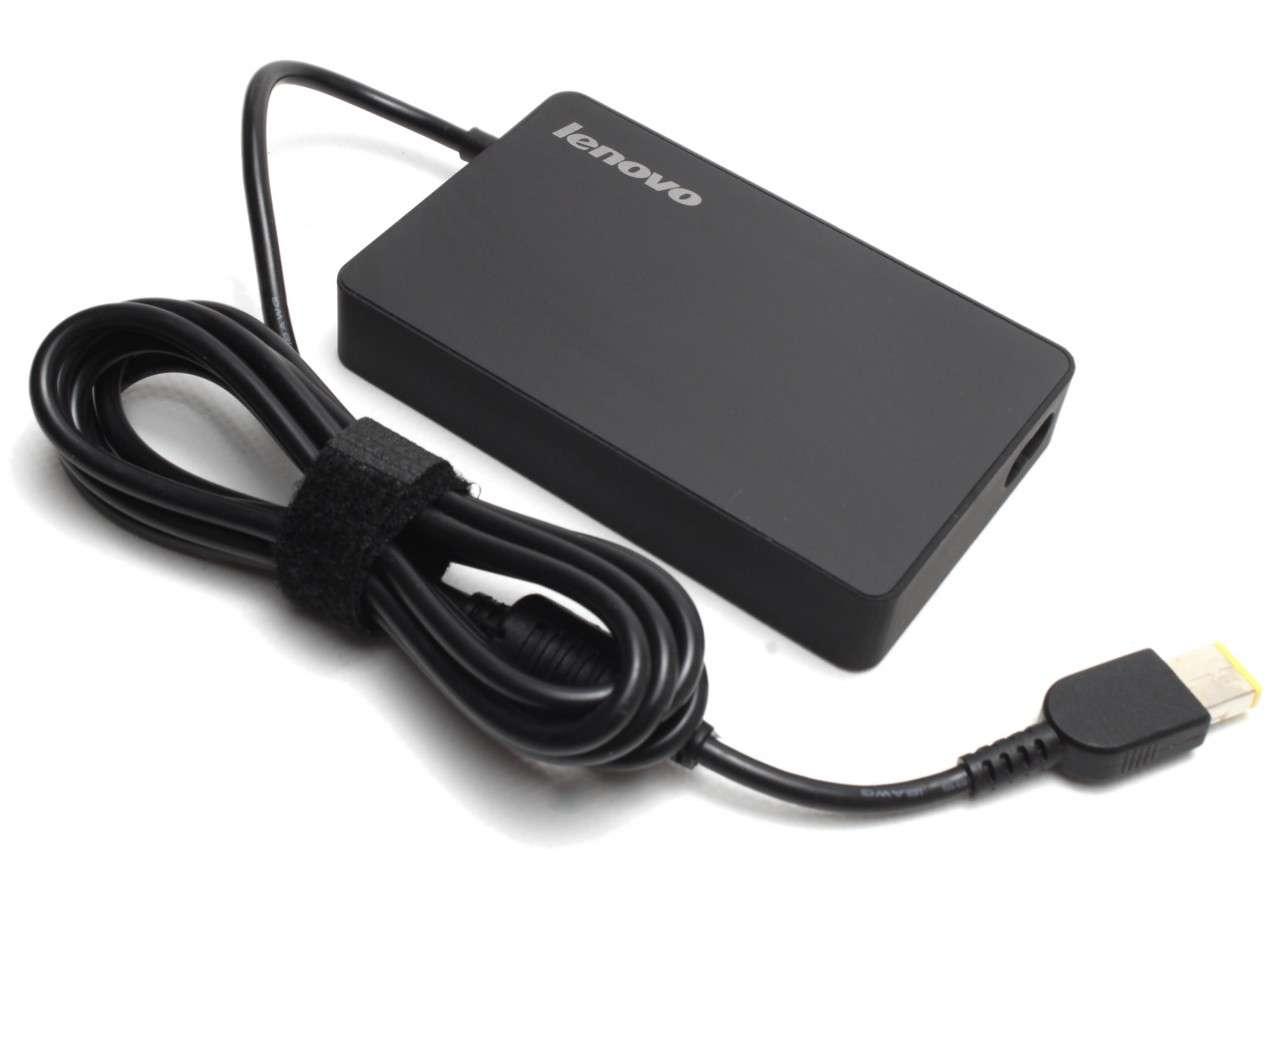 Incarcator Lenovo IdeaPad S500 6556 65W imagine powerlaptop.ro 2021